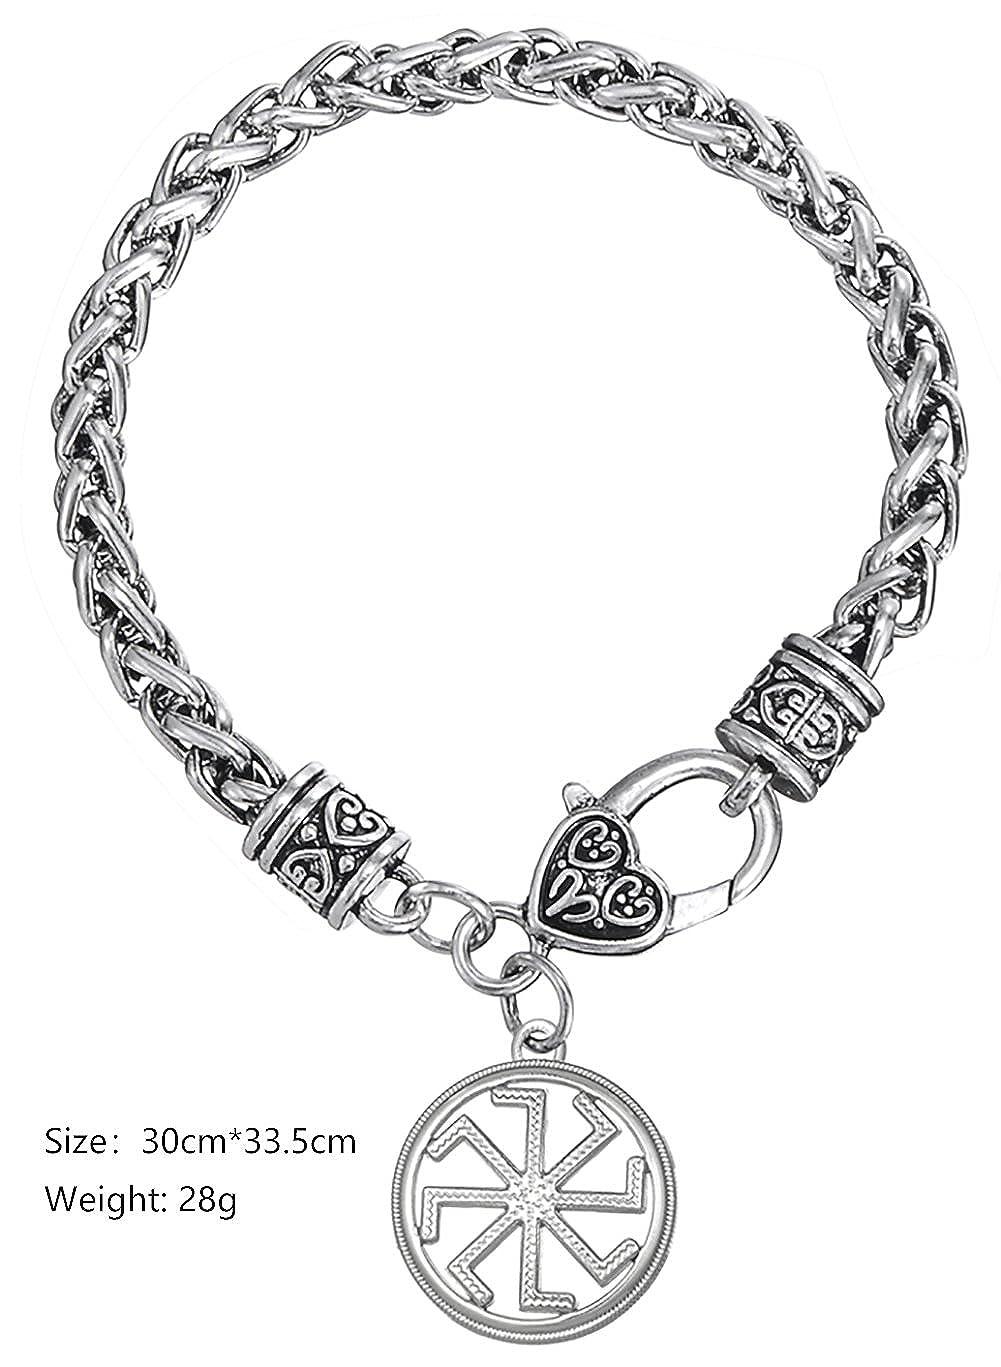 VASSAGO Ancient Myth Slavic God Kolovrat Sun Wheel Pendant Talisman Amulet Wheat Chain Bracelet